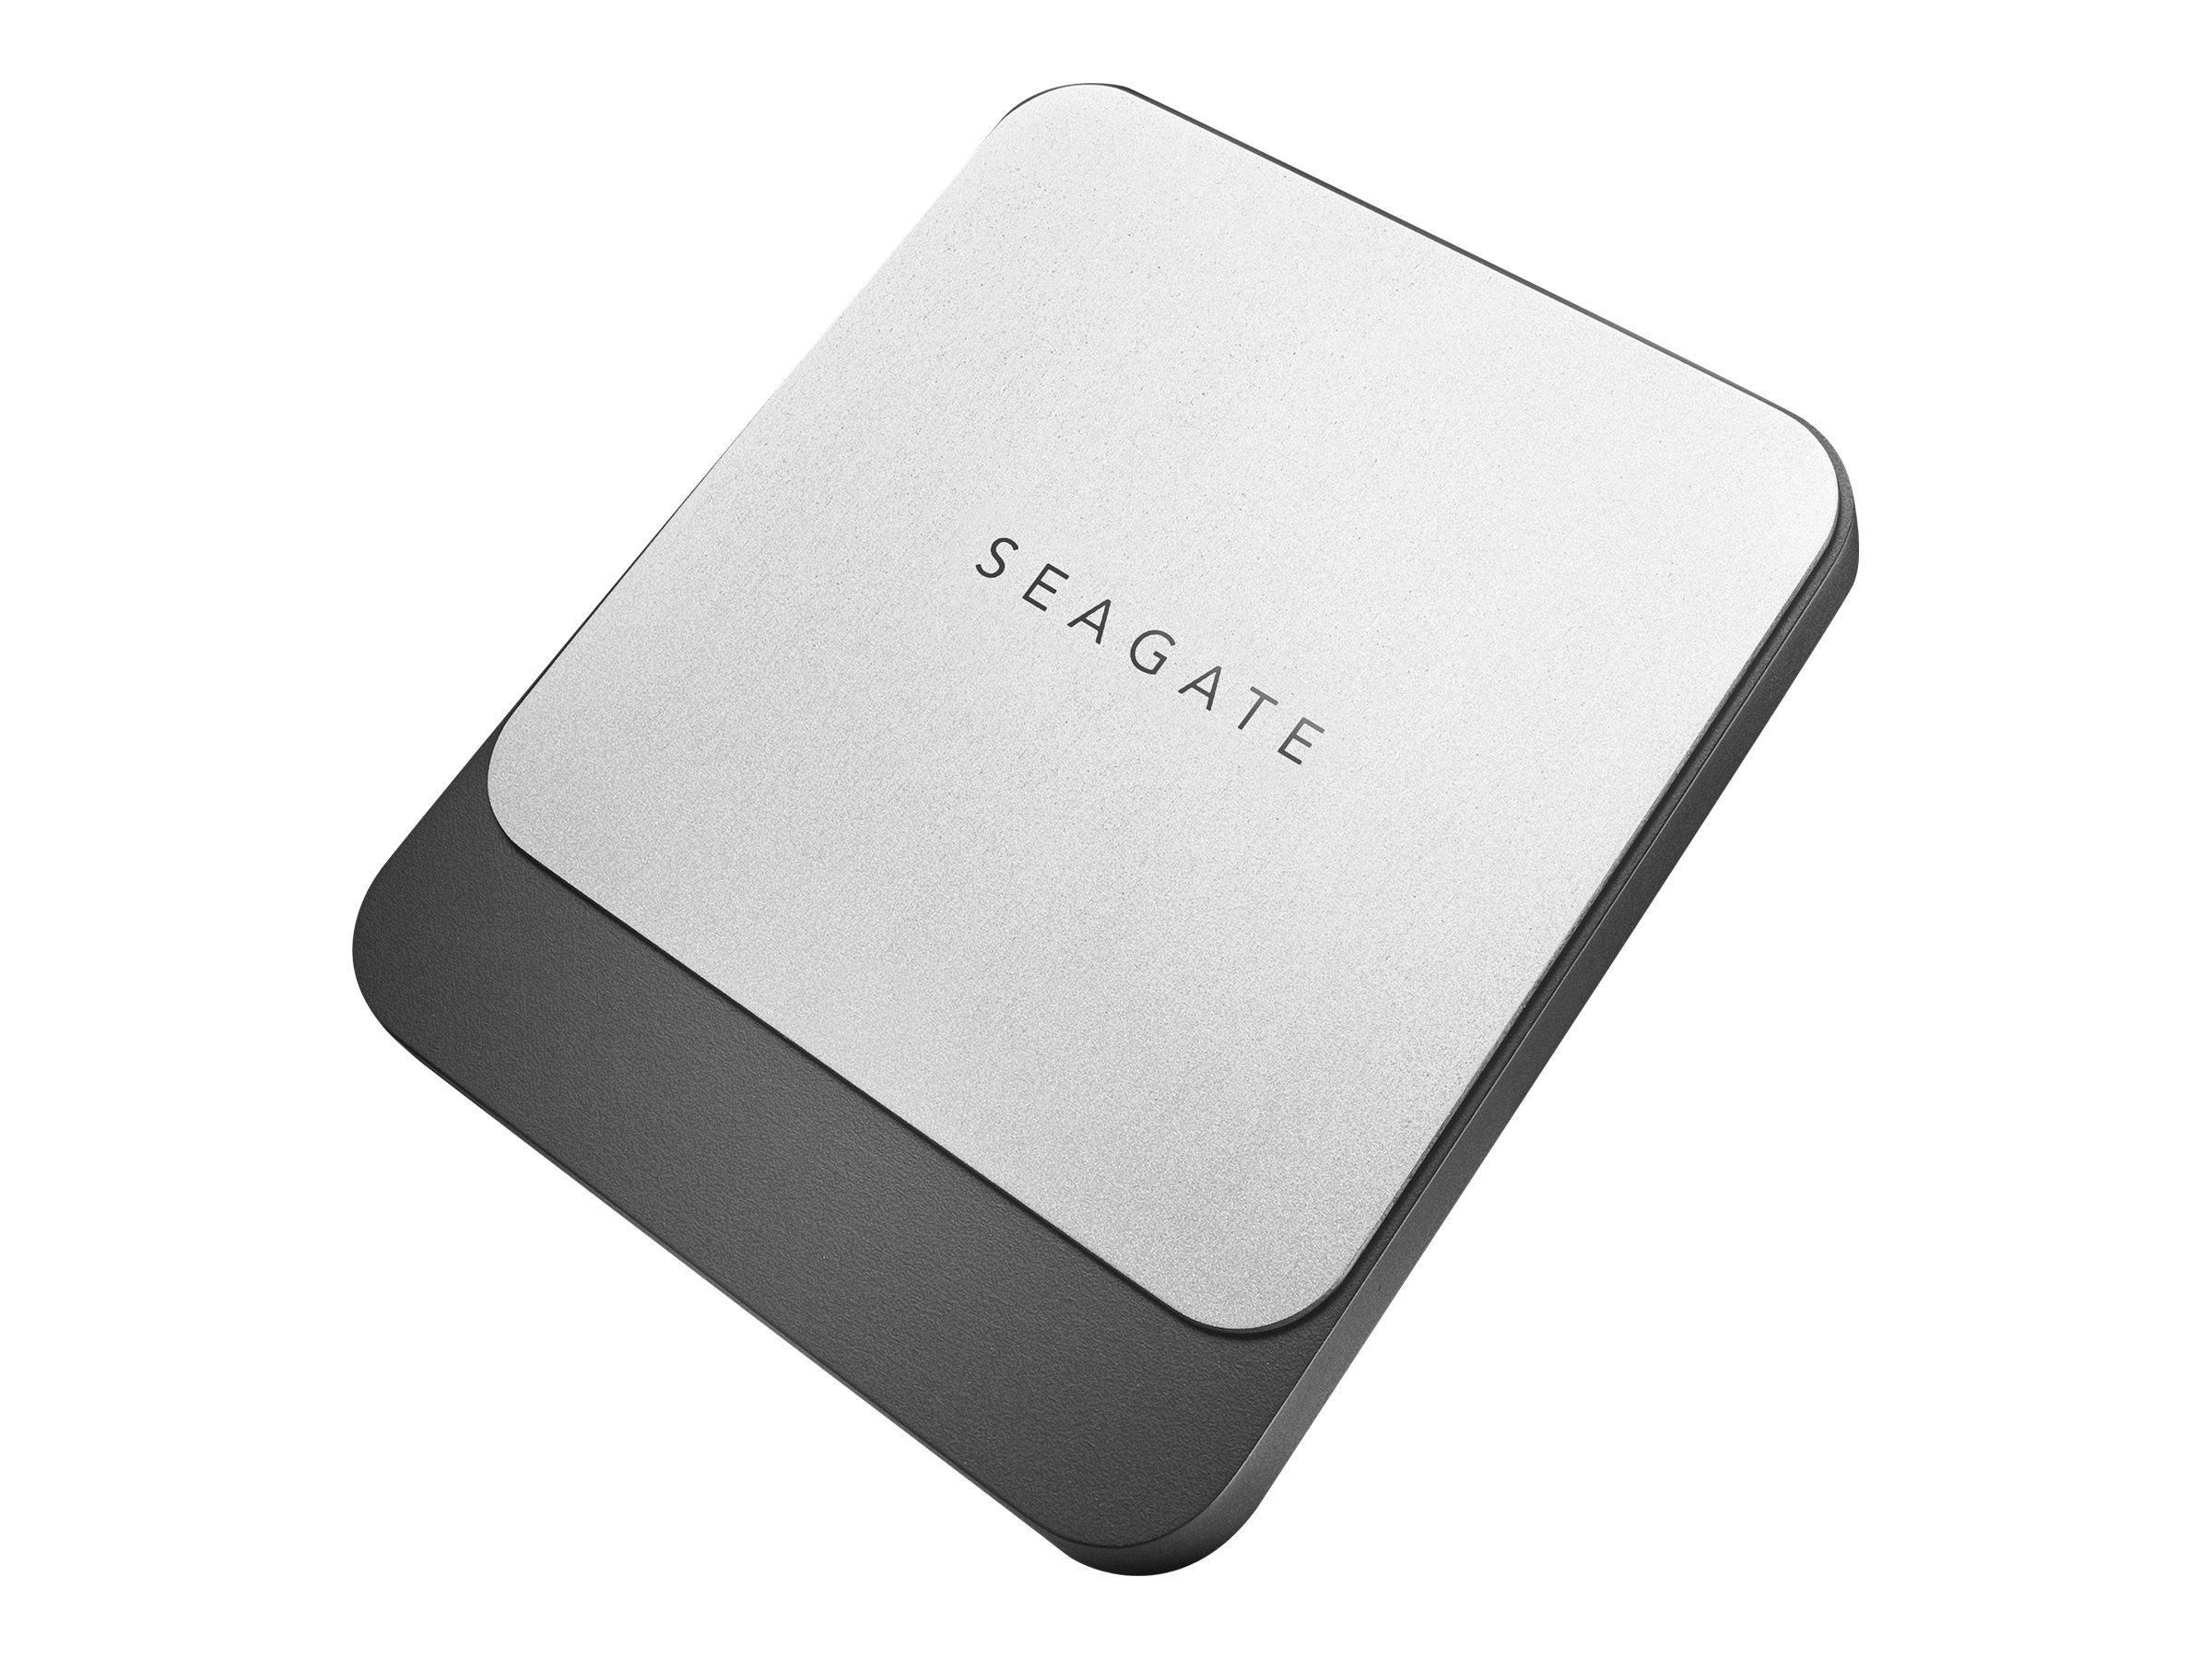 Seagate Fast STCM250400 - Solid-State-Disk - 250 GB - extern (tragbar) - USB 3.0 (USB-C Steckverbinder) - Schwarz